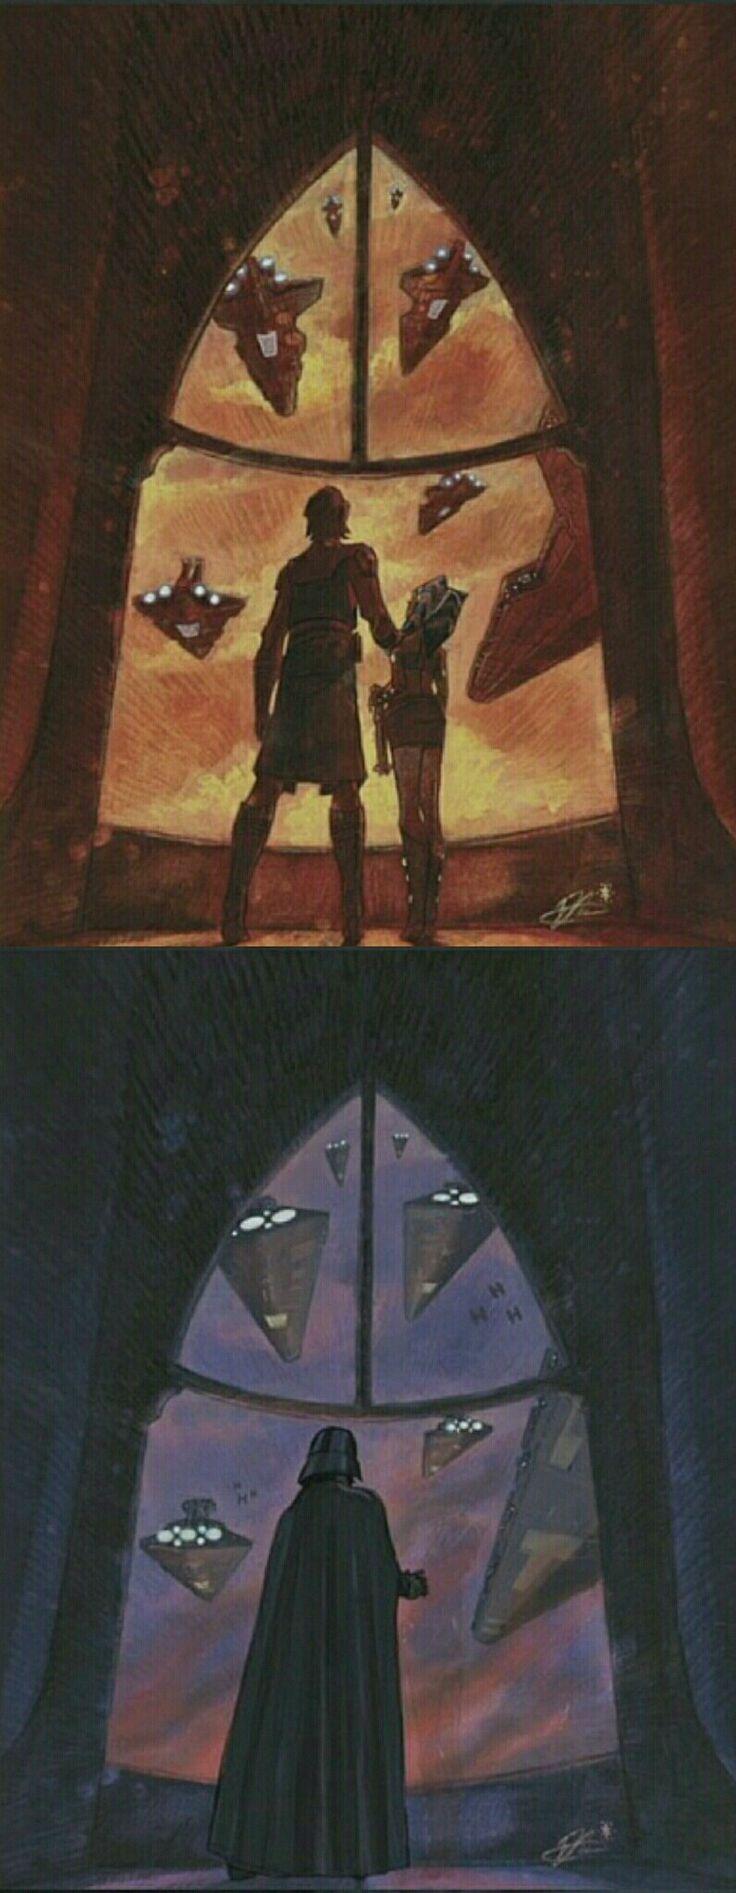 How time has changed... | @ddobrdi || (: for more pins follow my board: The Clone Wars | Anakin & Ahsoka